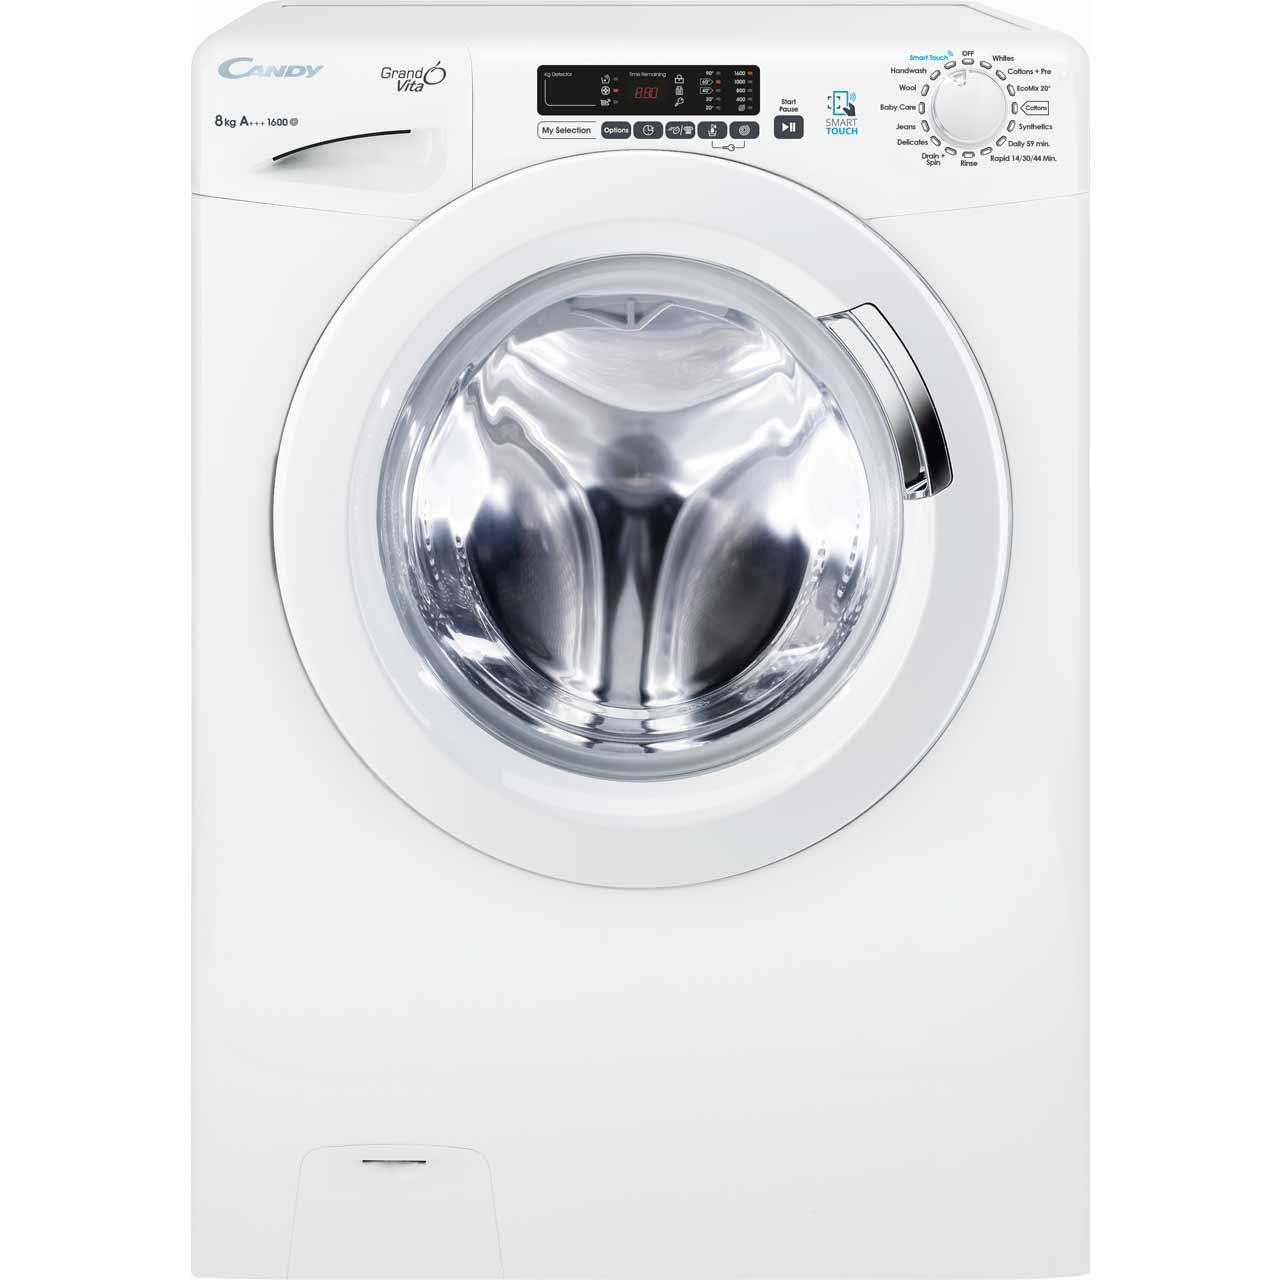 Vw 1600 Max Rpm: Candy GVS168D3 Grand'O Vita A+++ 8Kg 1600 RPM Washing